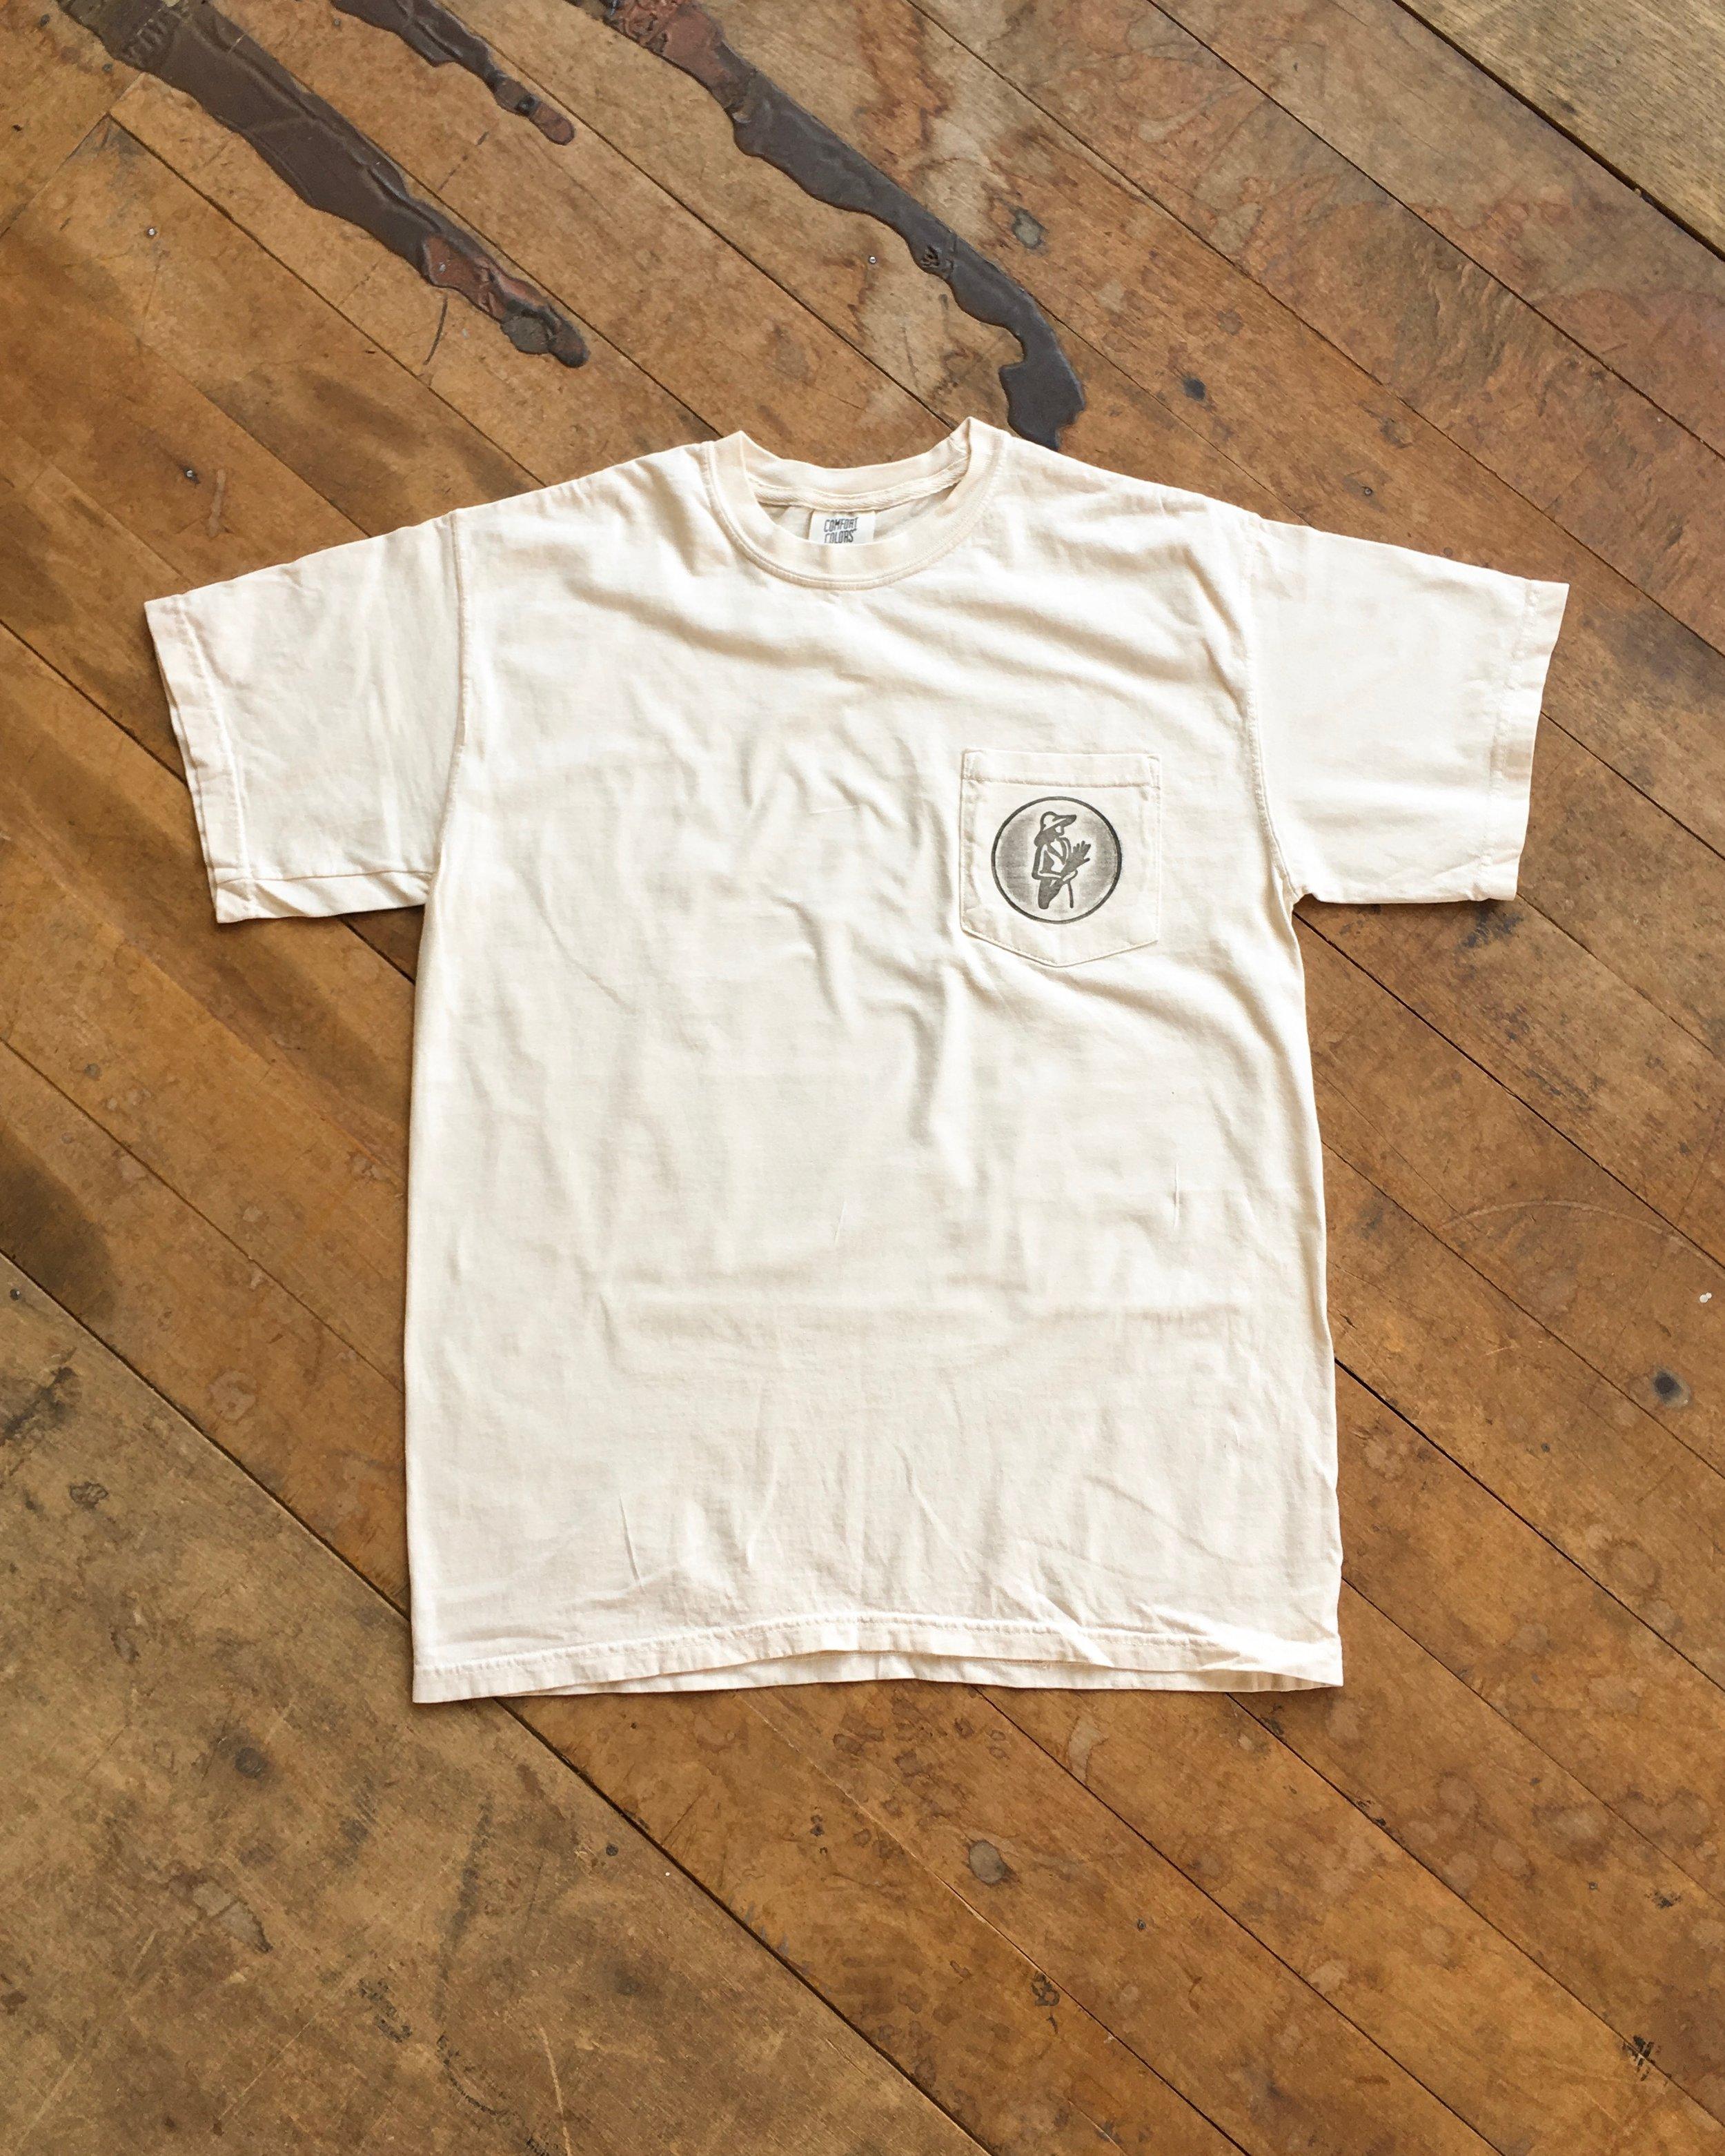 wb stamp shirt.JPG